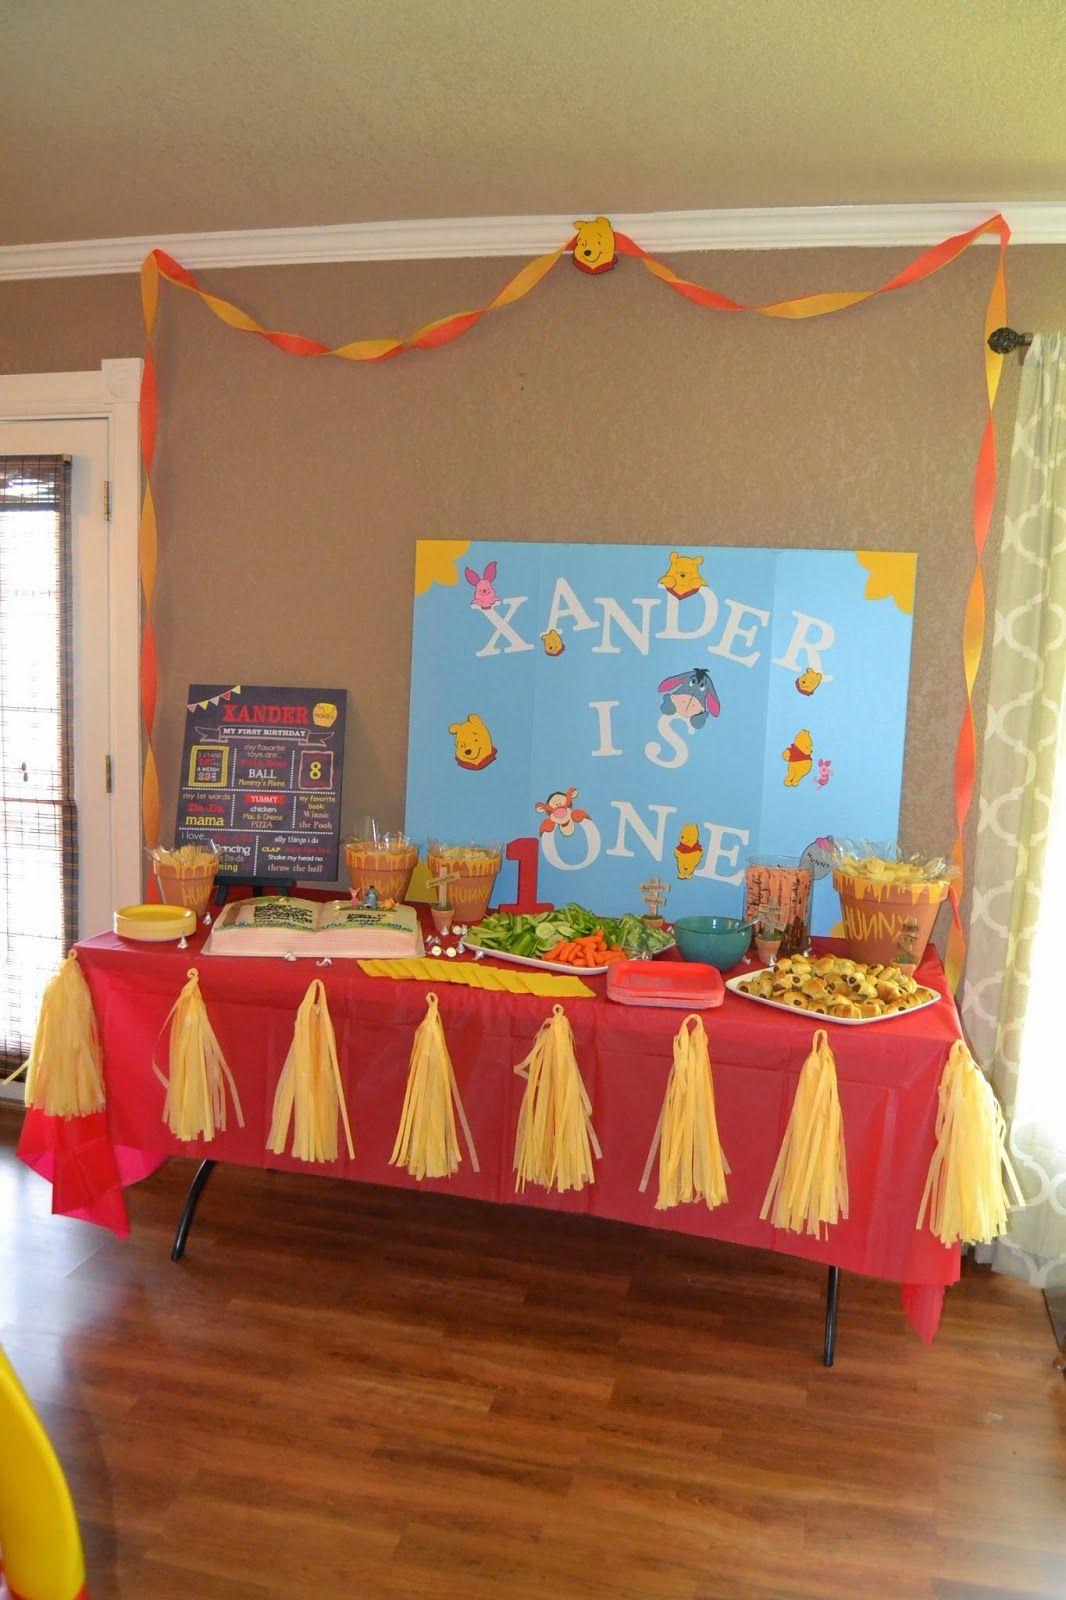 Xanders First Birthday Party Winnie the Pooh via amandafadler